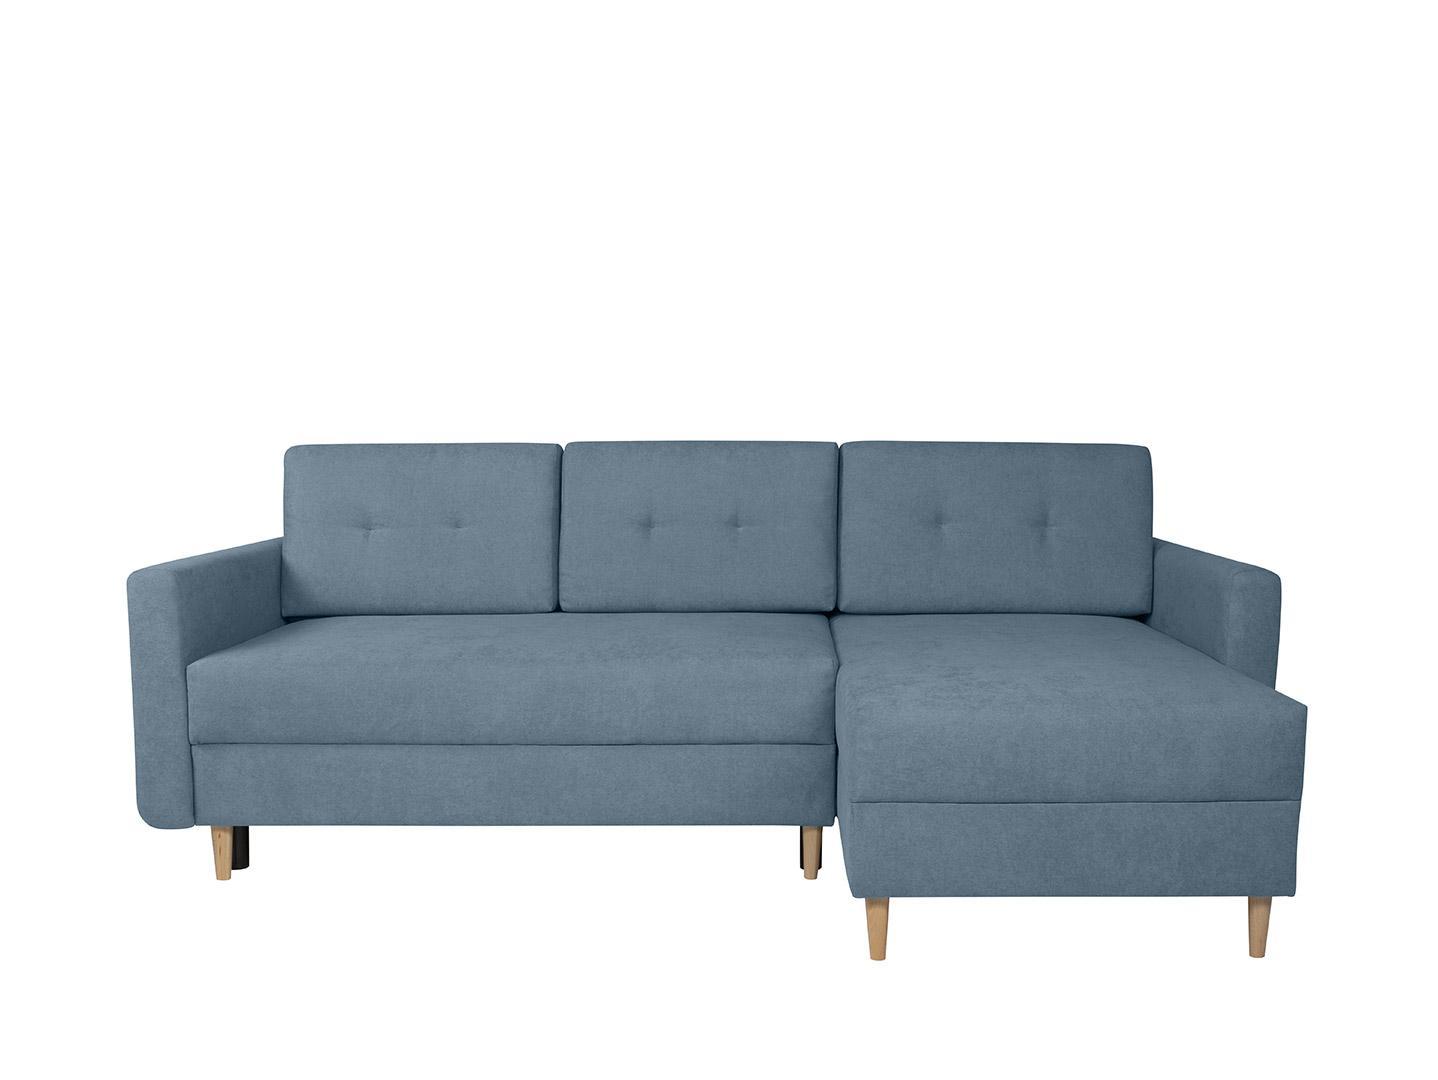 Rohová sedačka BRW Feliz Lux 3DL.URC (tyrkysová) (P)